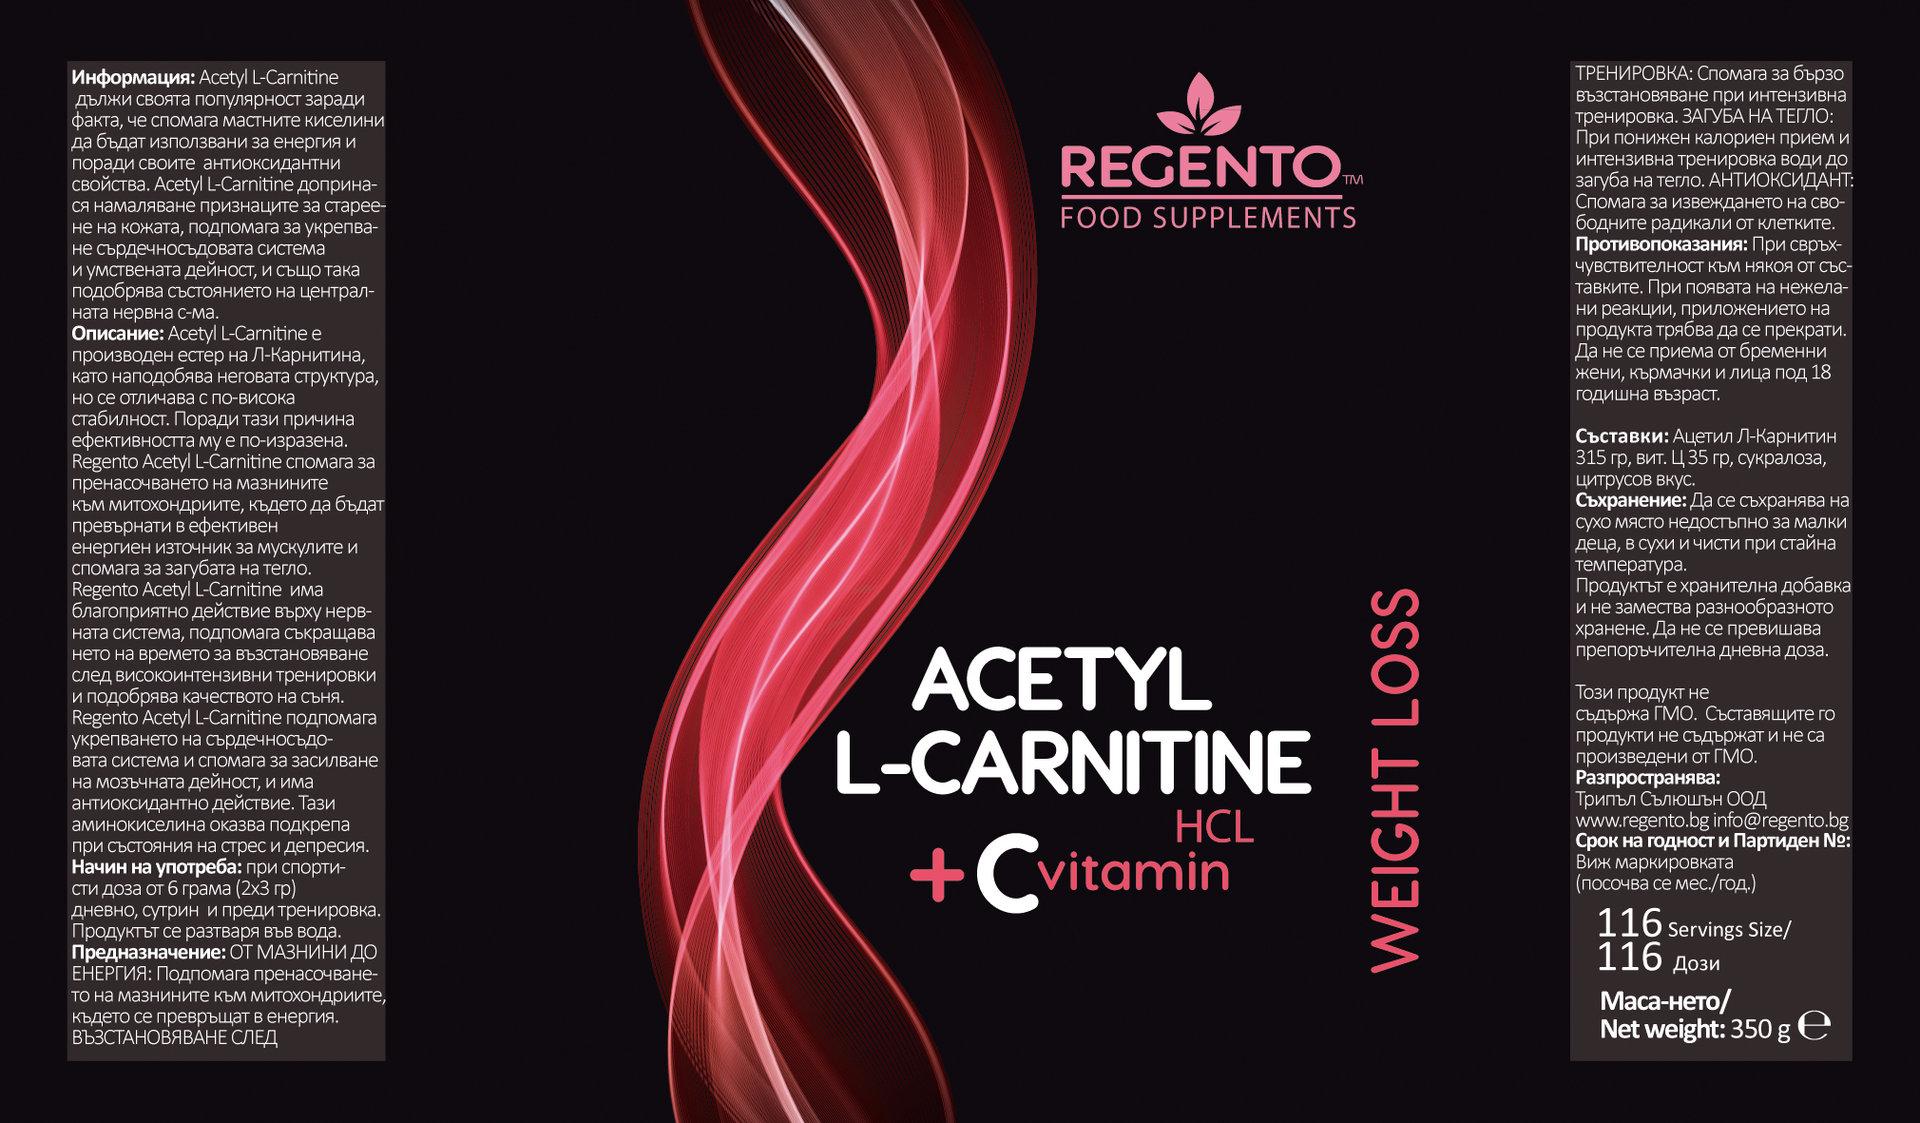 REGENTO ACETYL L-CARNITINE WTH VITAMIN C 350g